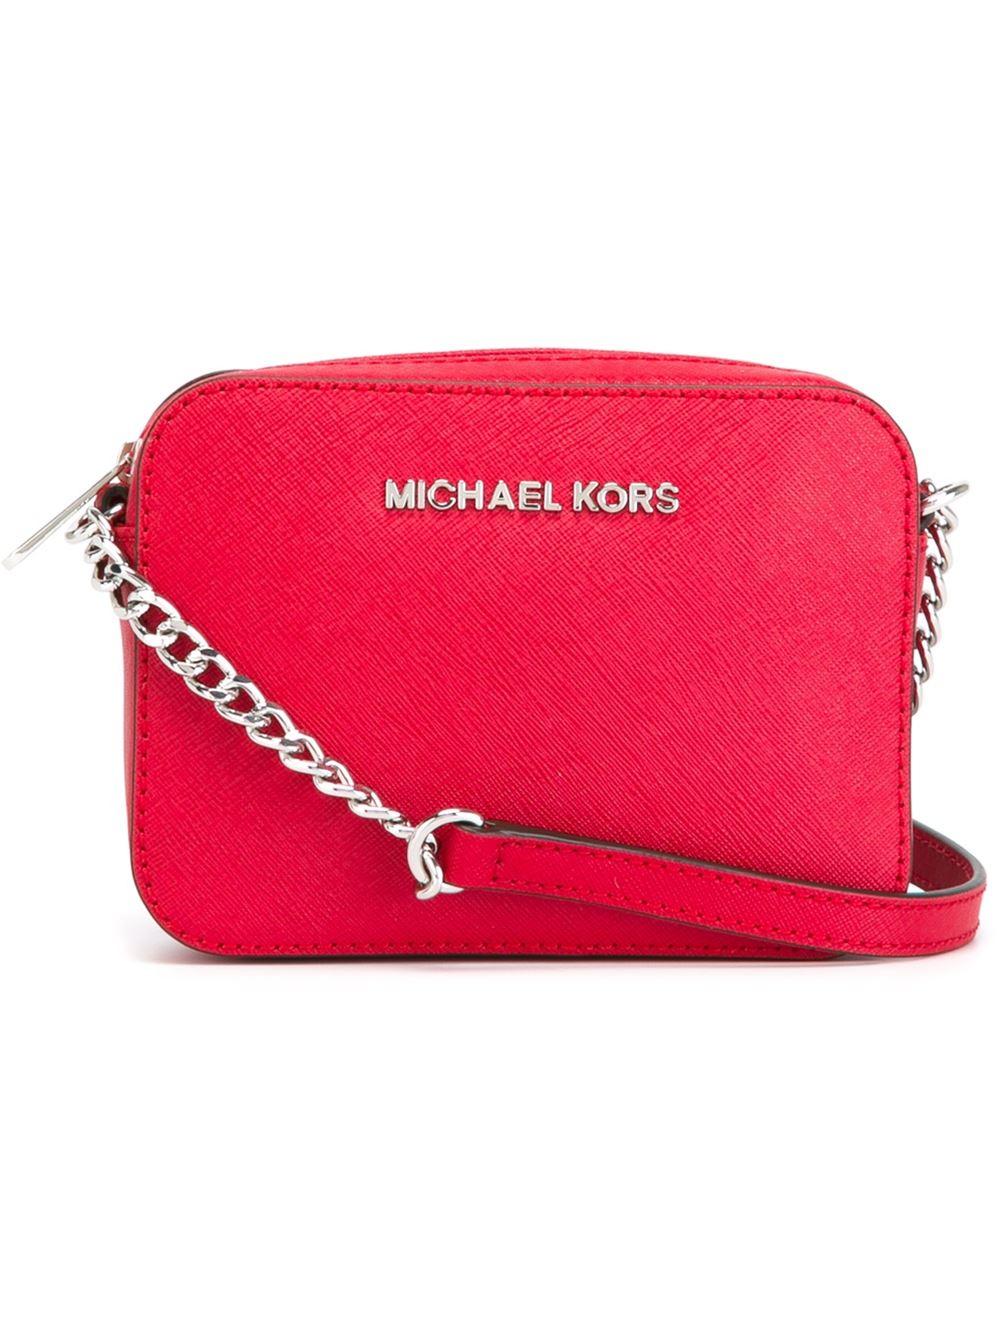 93a6dc8ba095 MICHAEL Michael Kors Jet Set Travel Mini Cross-Body Bag in Red - Lyst